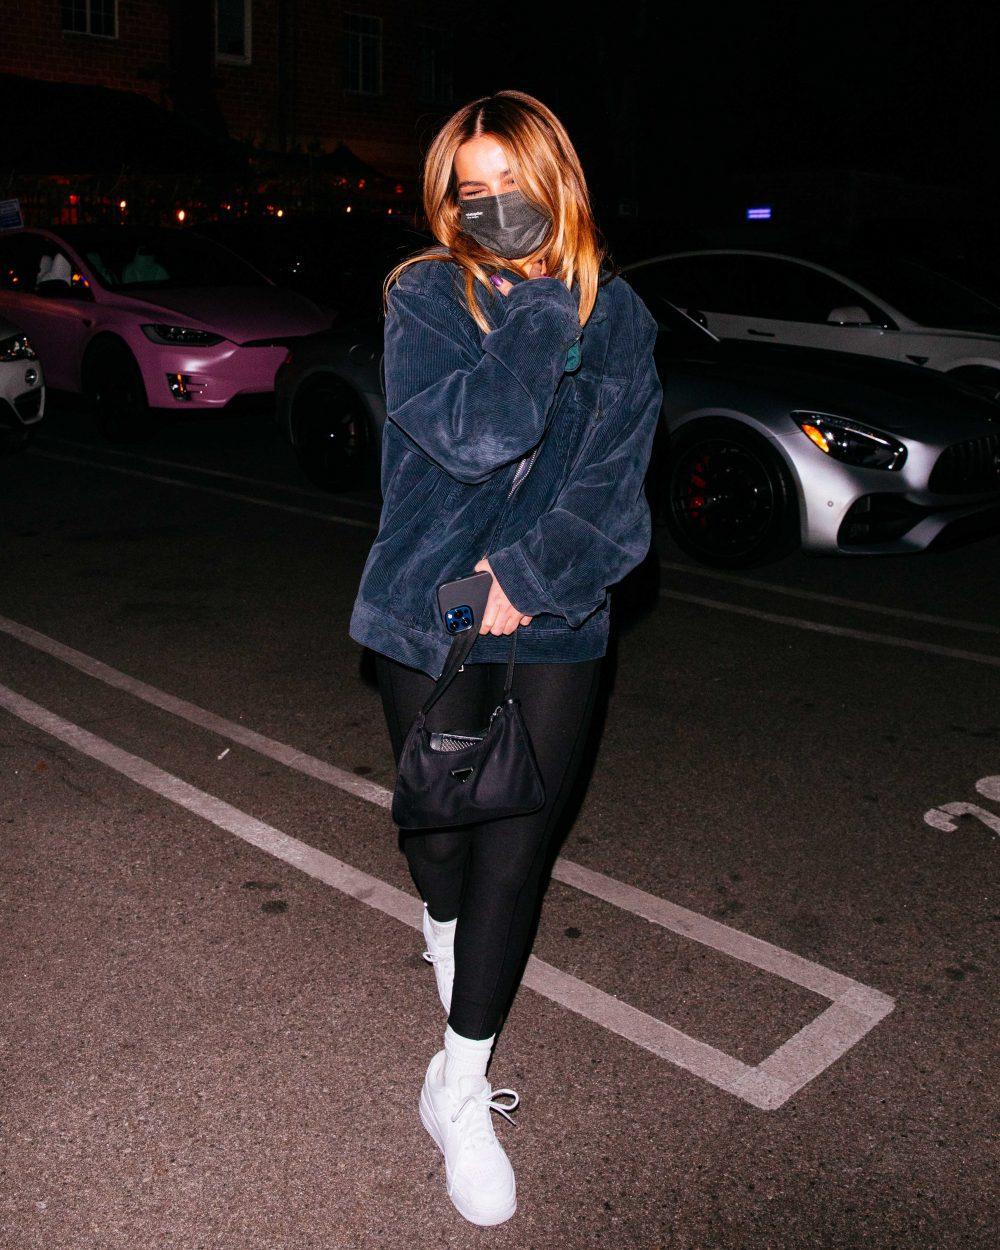 Addison Rae & The Kid Laroi leaves dinner at Matsuhisha